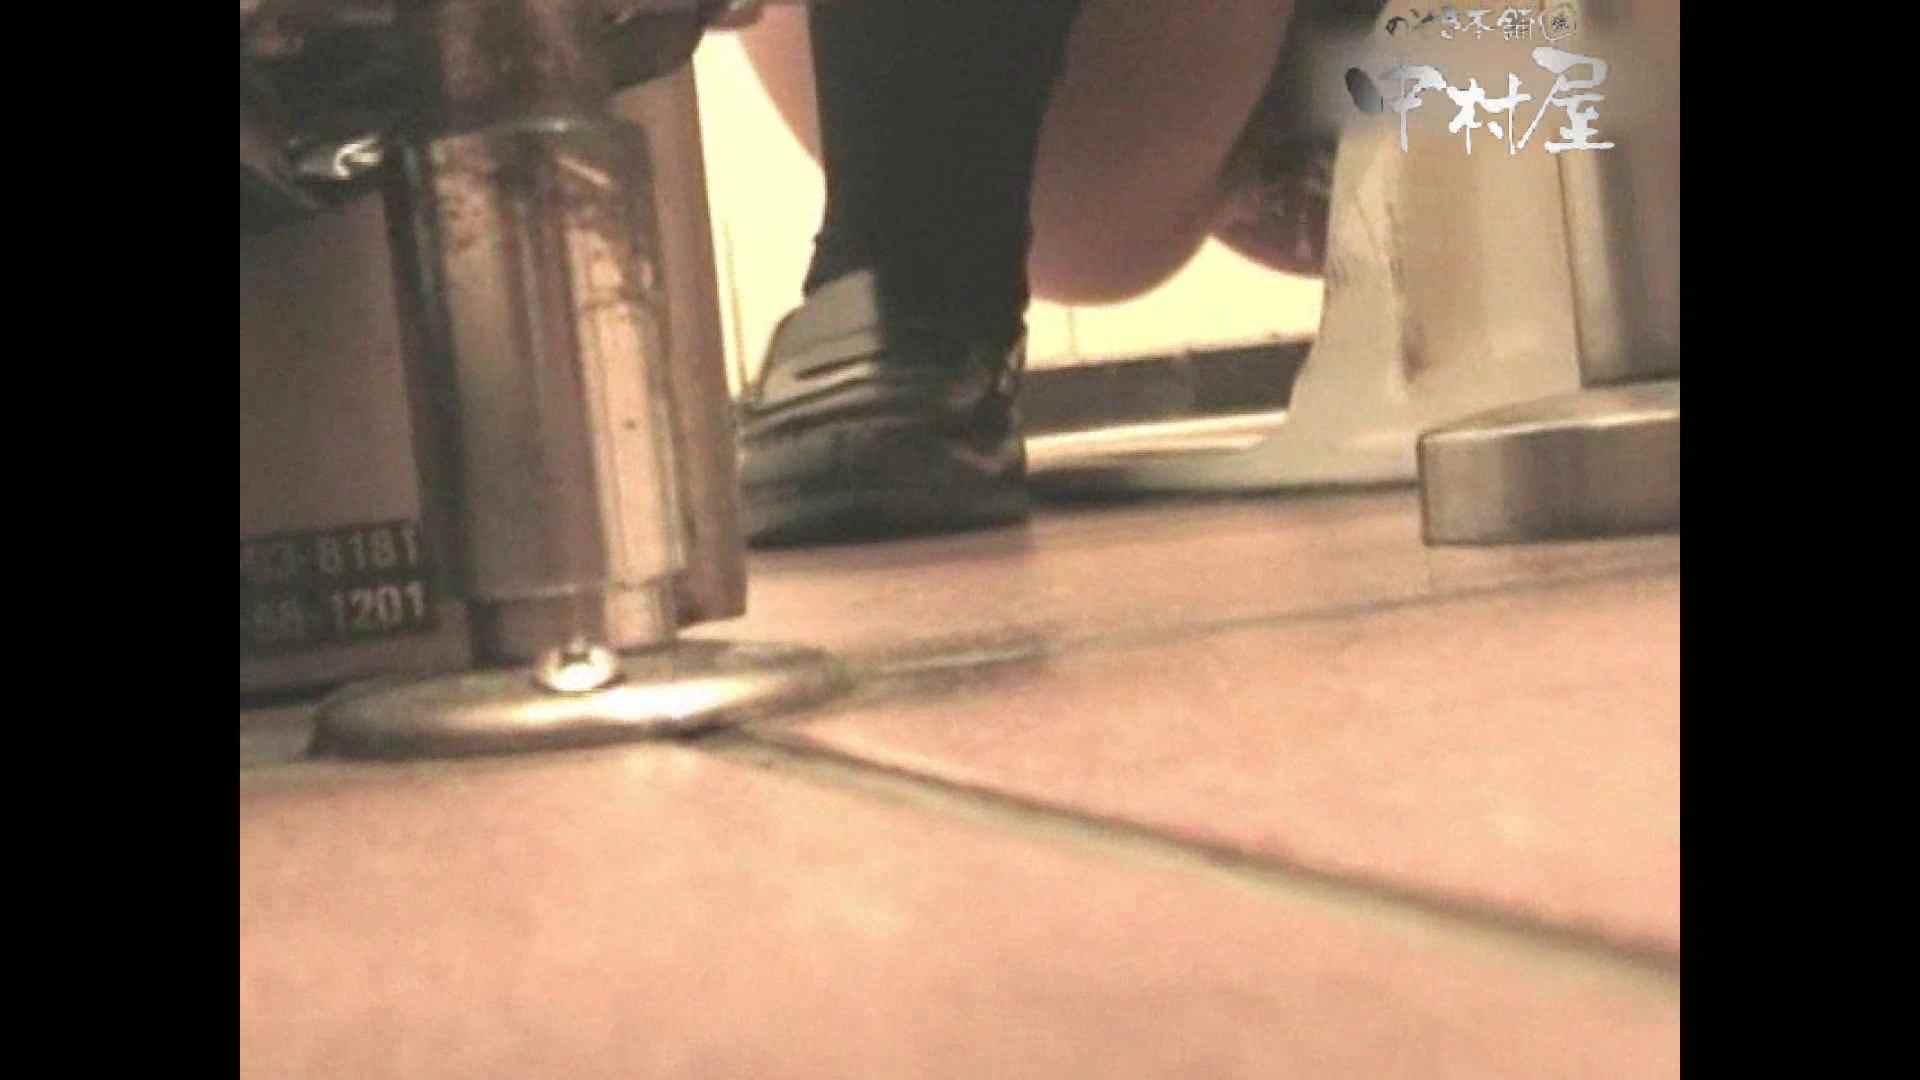 岩手県在住盗撮師盗撮記録vol.05 オマンコ秘宝館 セックス画像 20連発 18